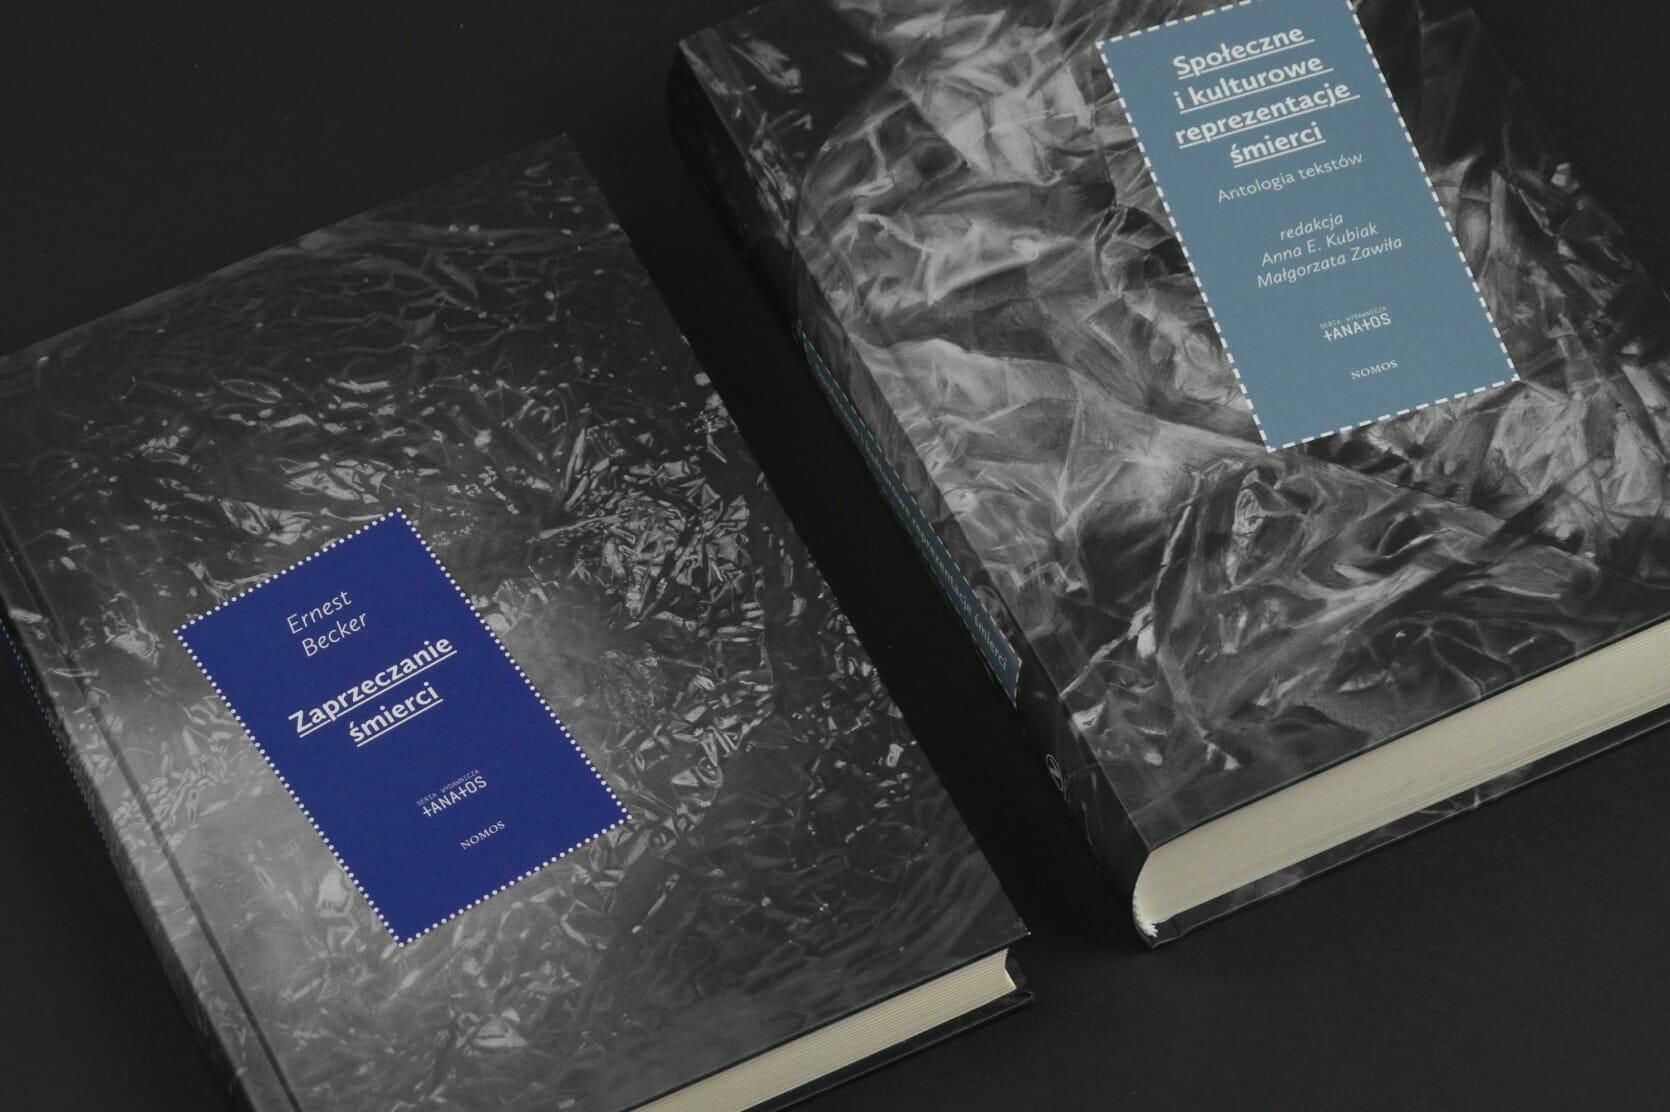 Thanatos Book series - two volumes together - closeup